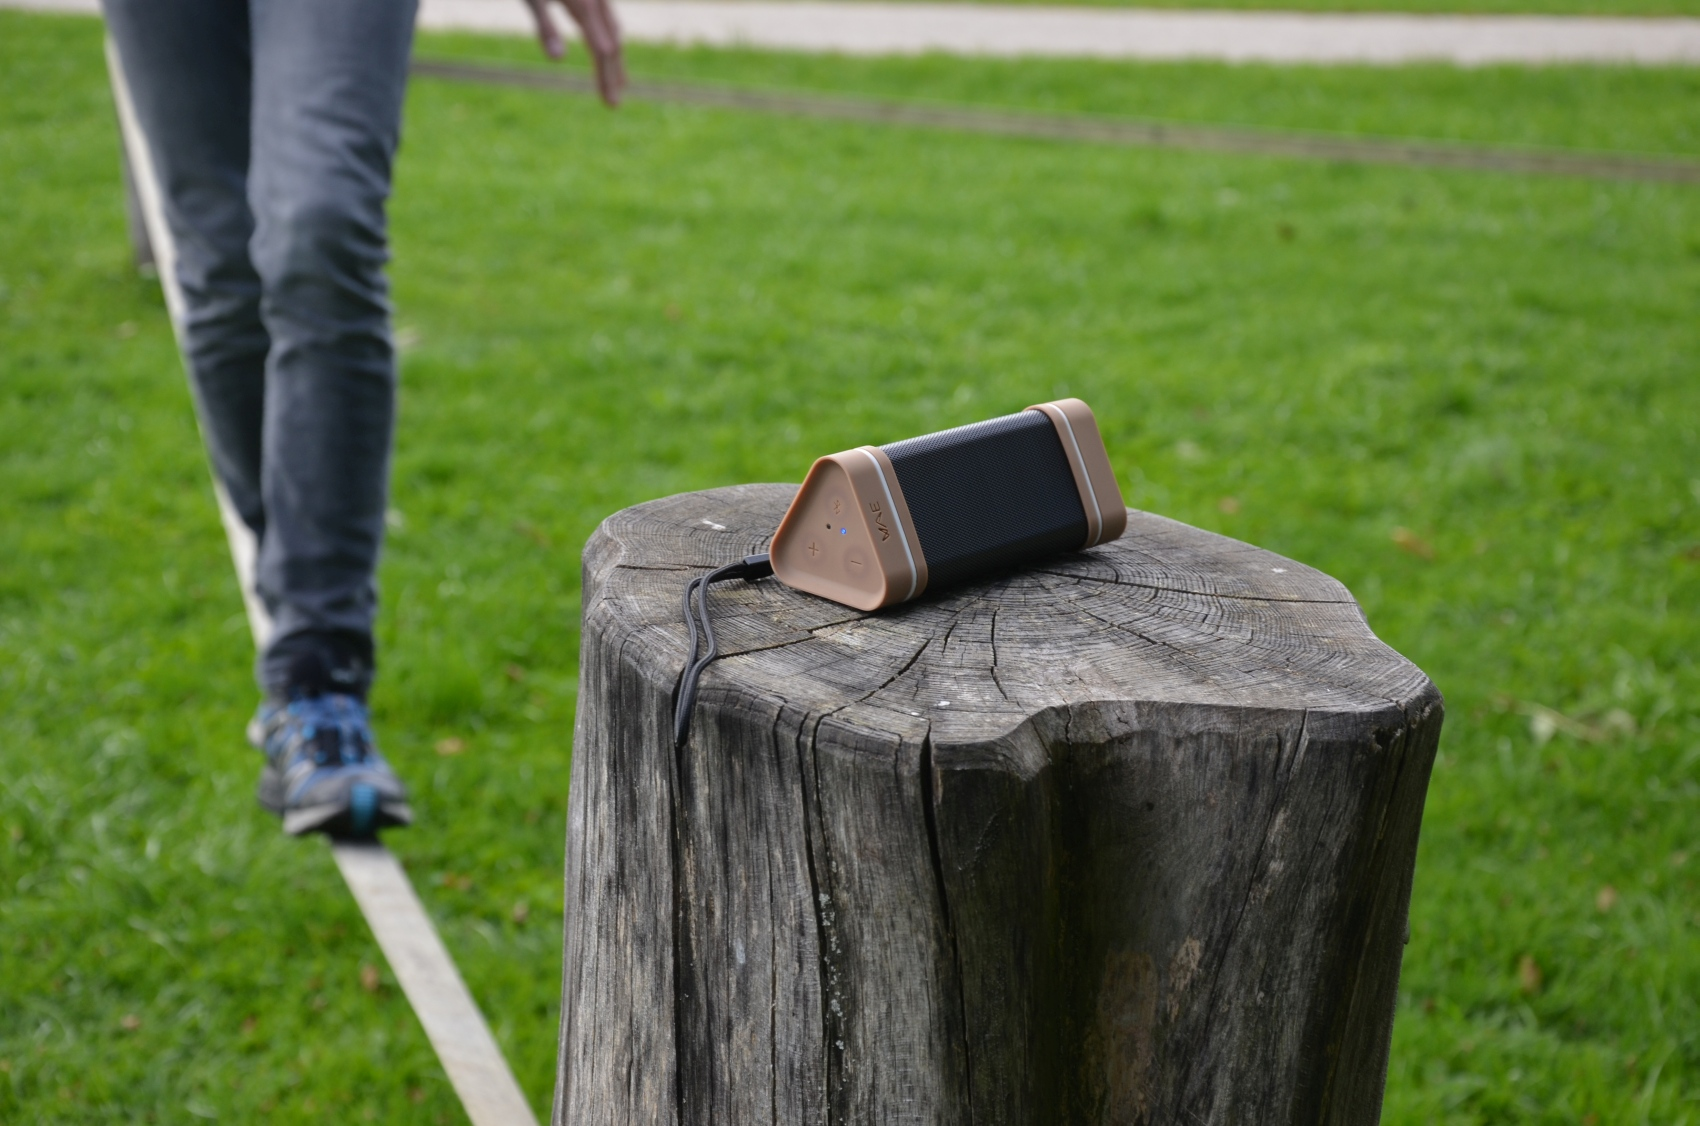 testbericht wae outdoor lautsprecher enziano blog. Black Bedroom Furniture Sets. Home Design Ideas